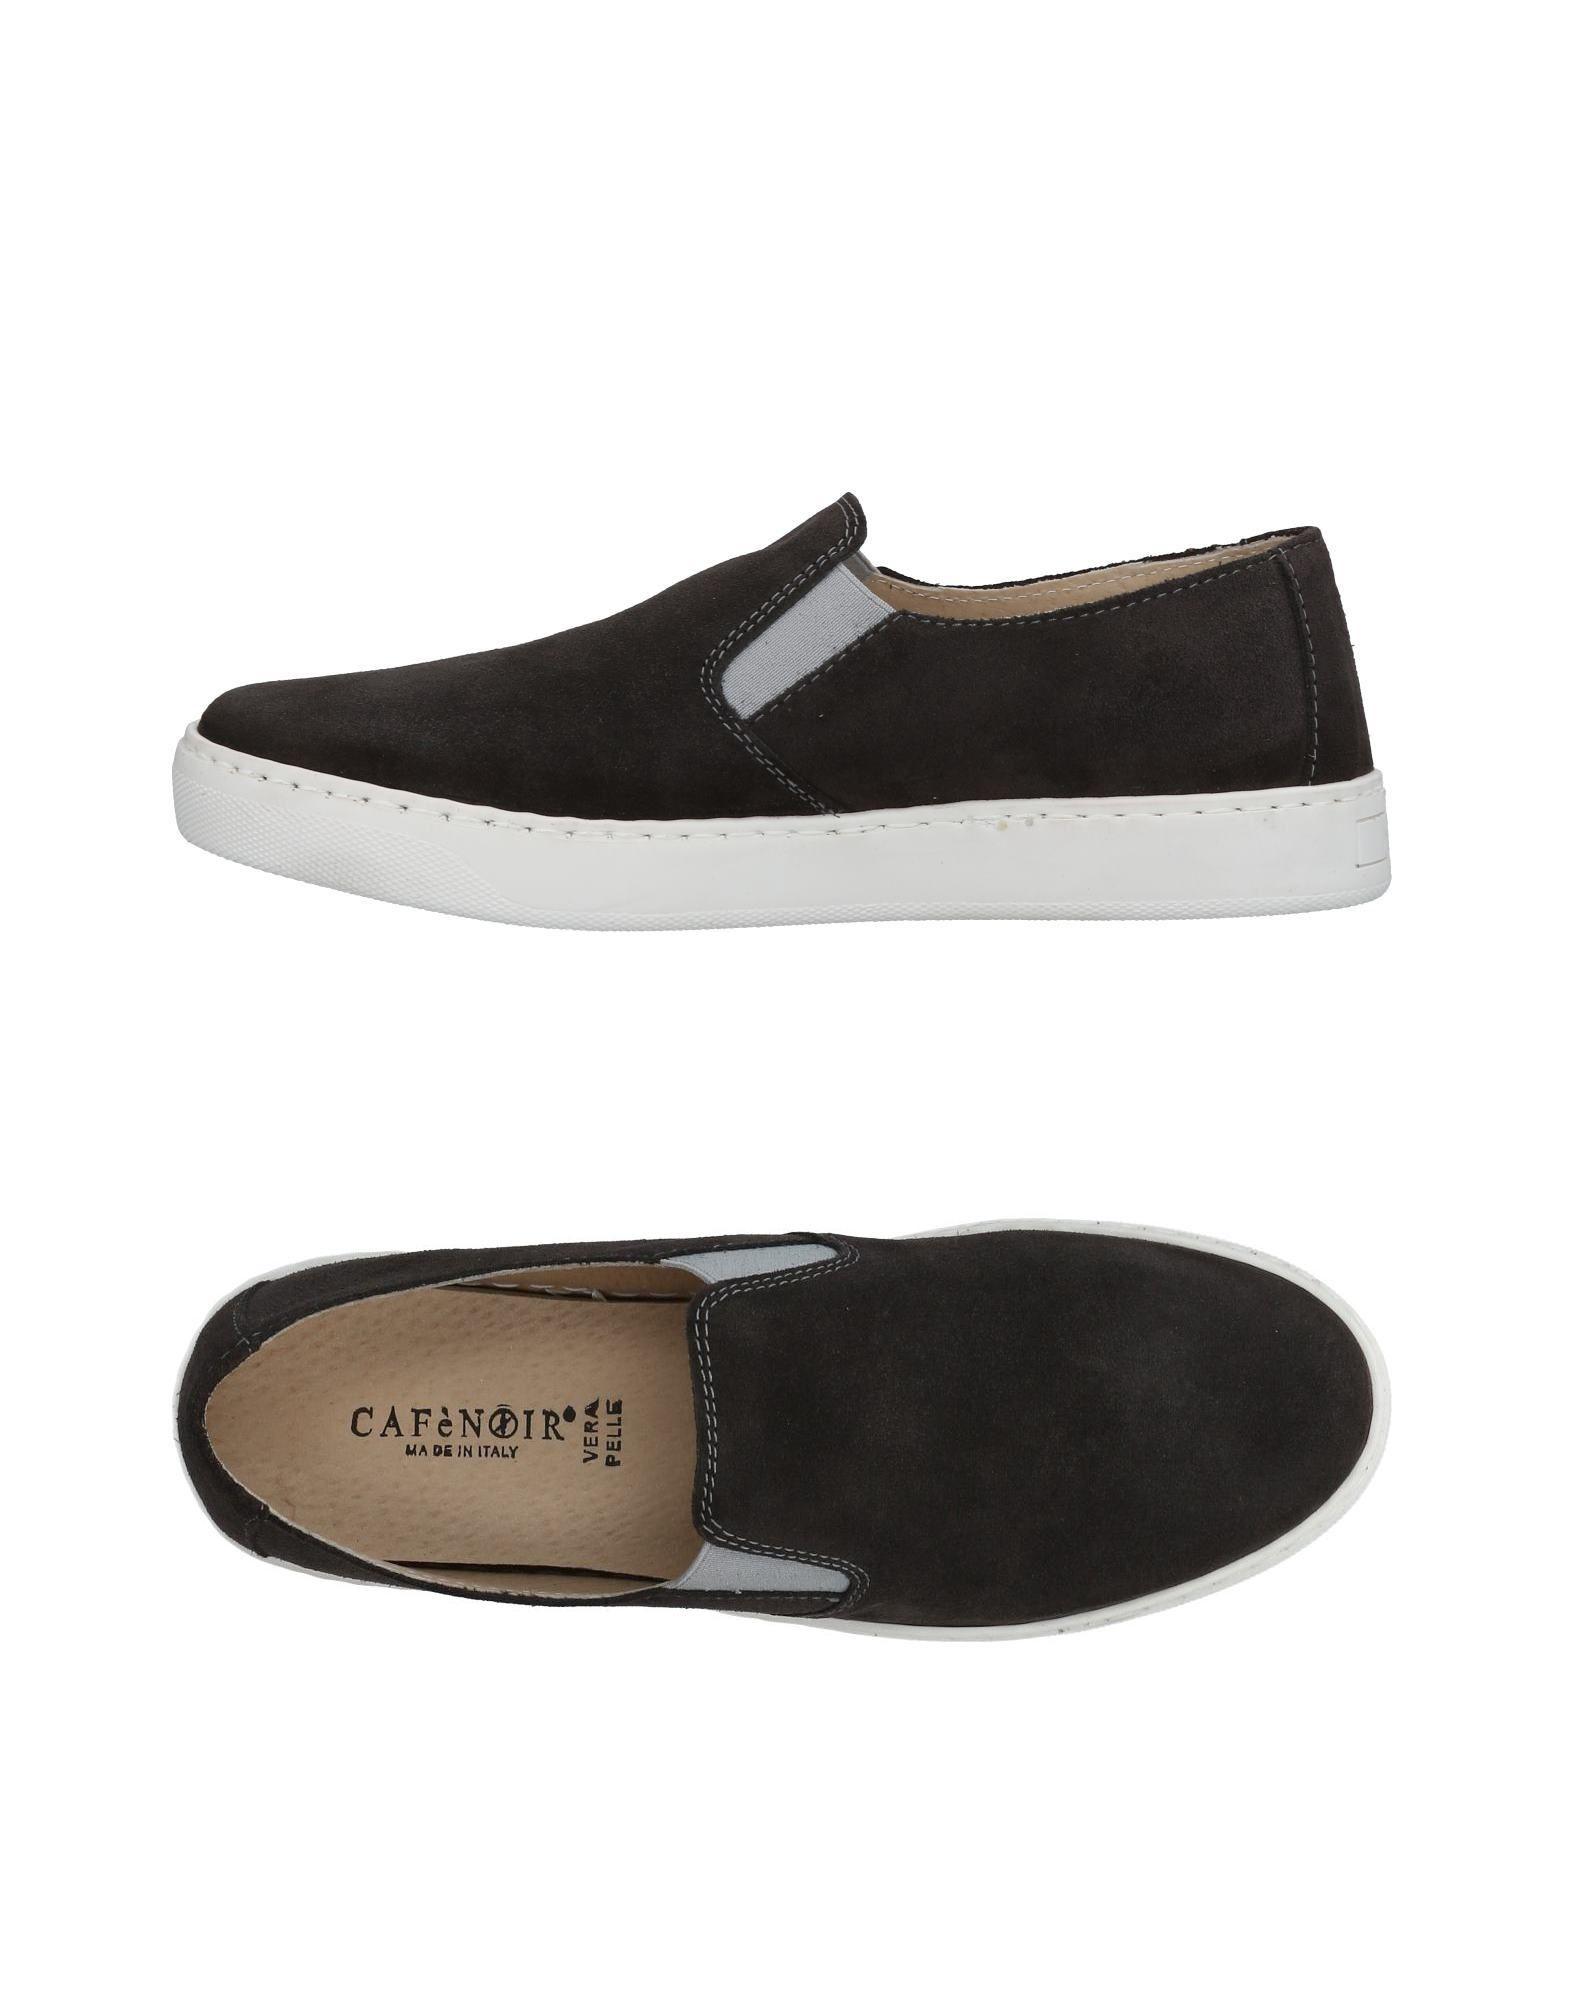 CAFèNOIR Herren Low Sneakers & Tennisschuhe Farbe Granitgrau Größe 5